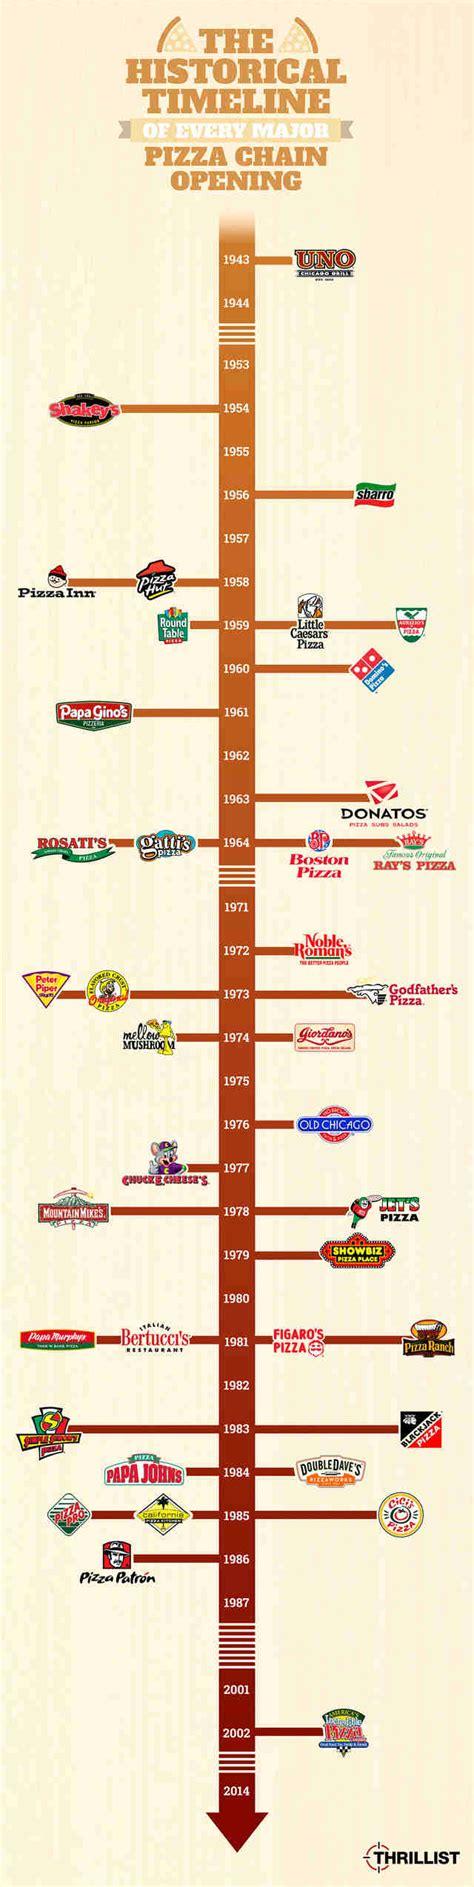 Pizza History   Dominos, Pizza Hut, Little Caesar's Facts